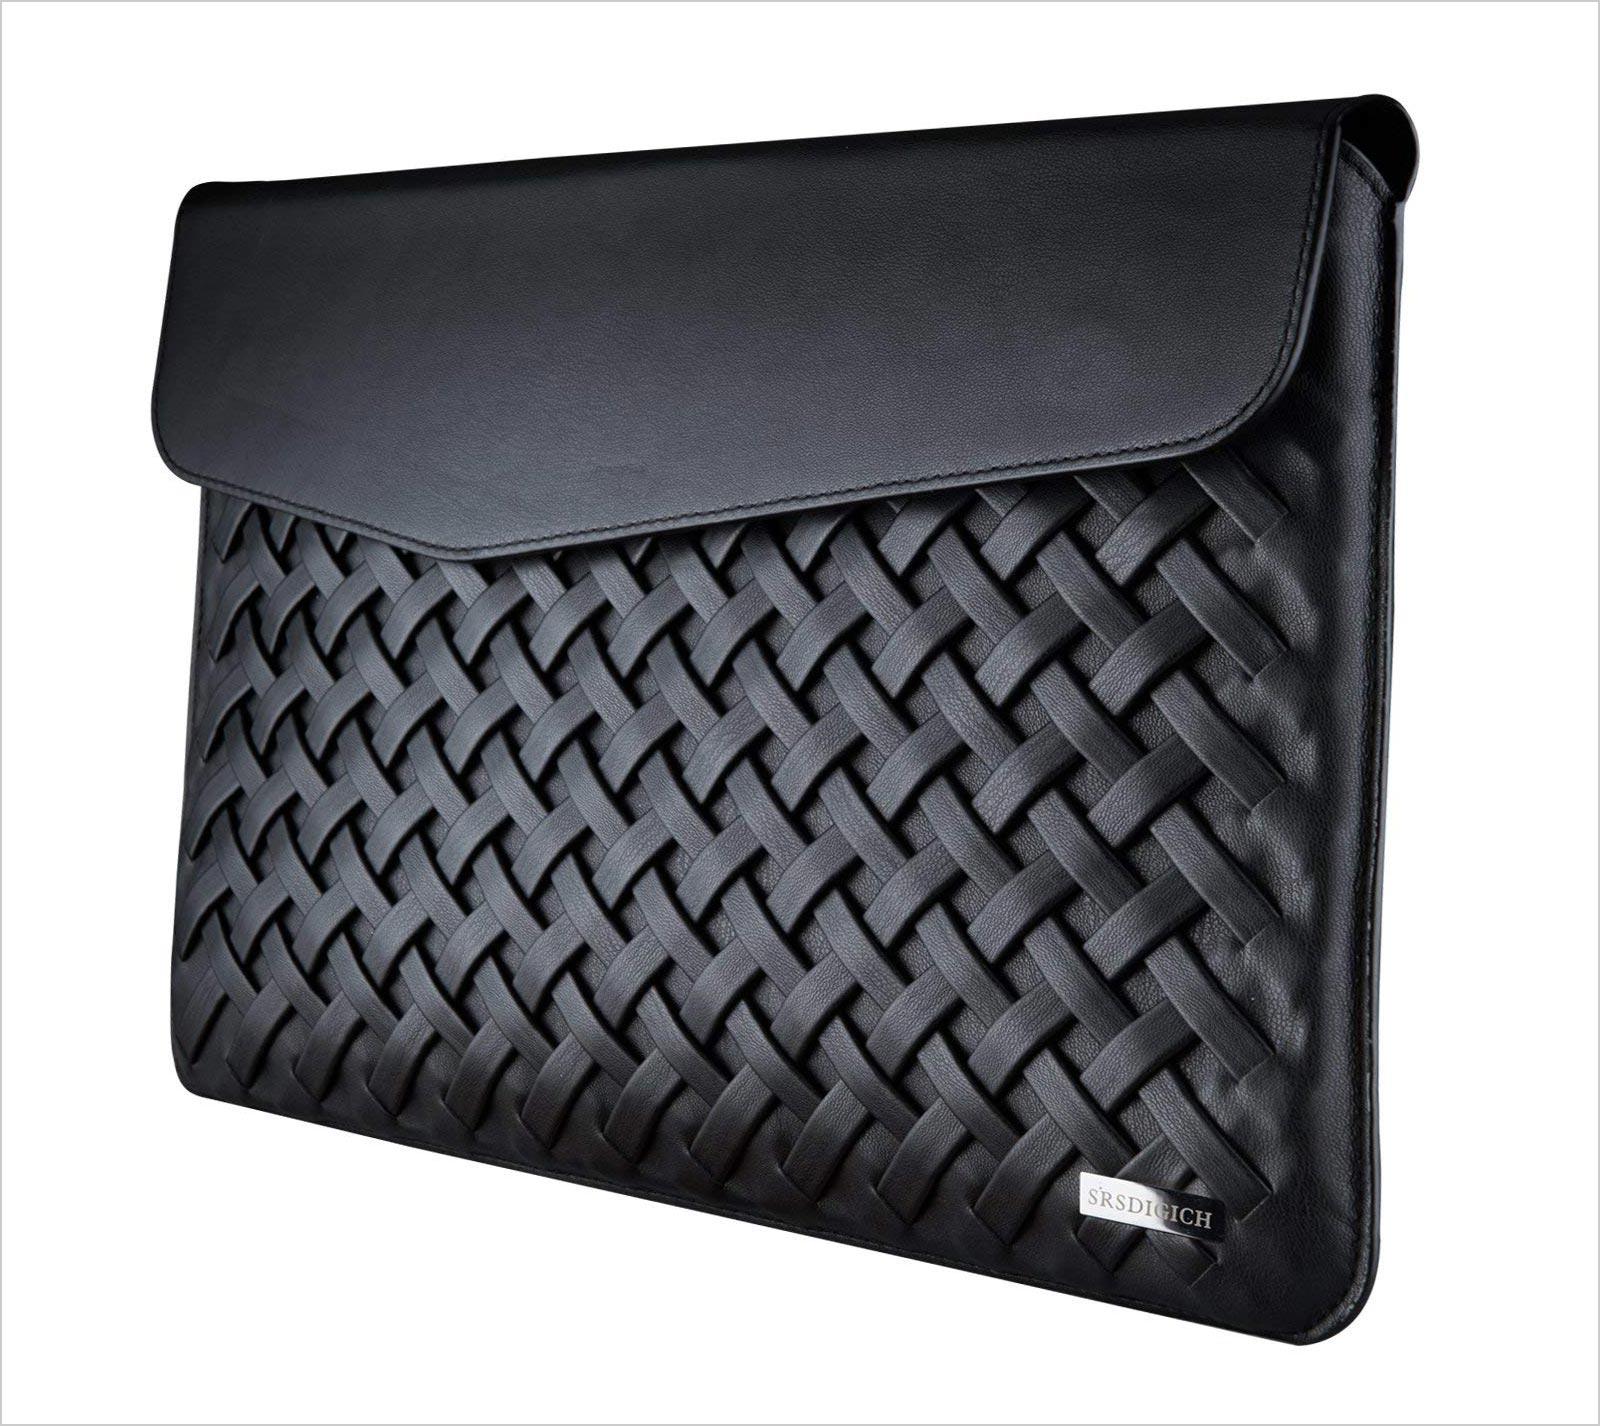 Soft-Leather-Handbag-iPad-Pro-11-and-12-9-inches